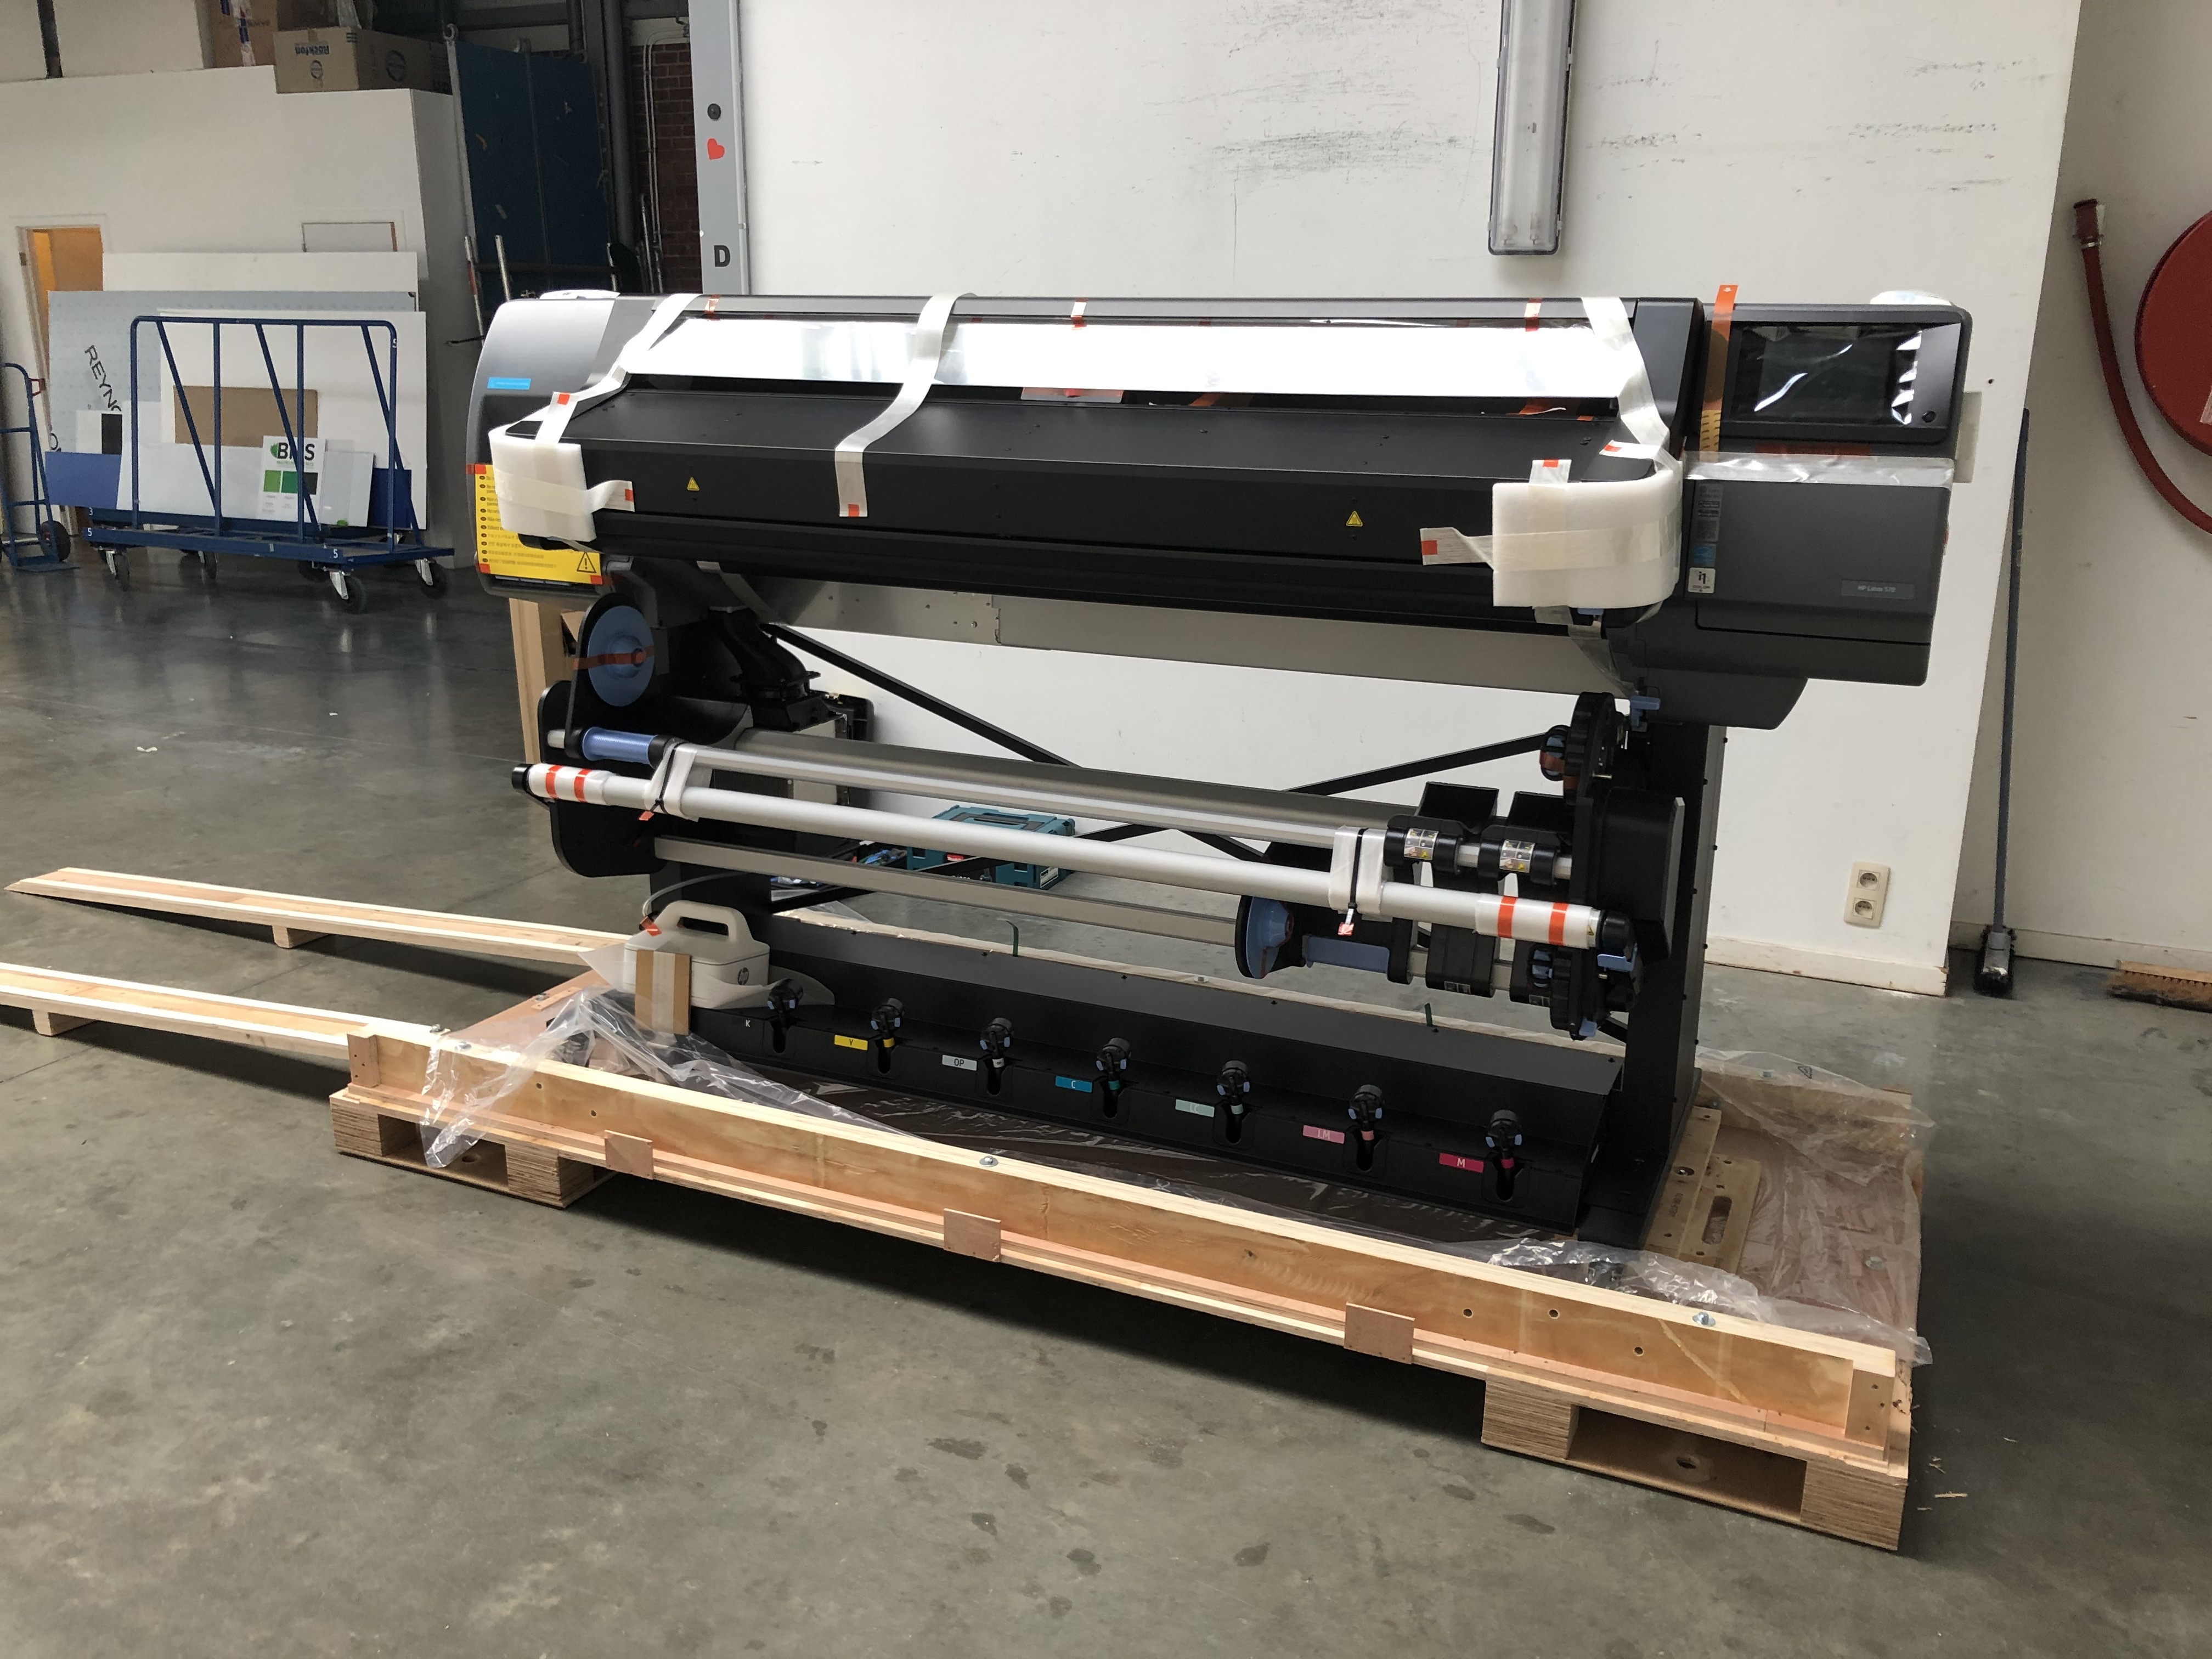 XL Reklame Mechelen - HP Latex 570 Printer - installatie